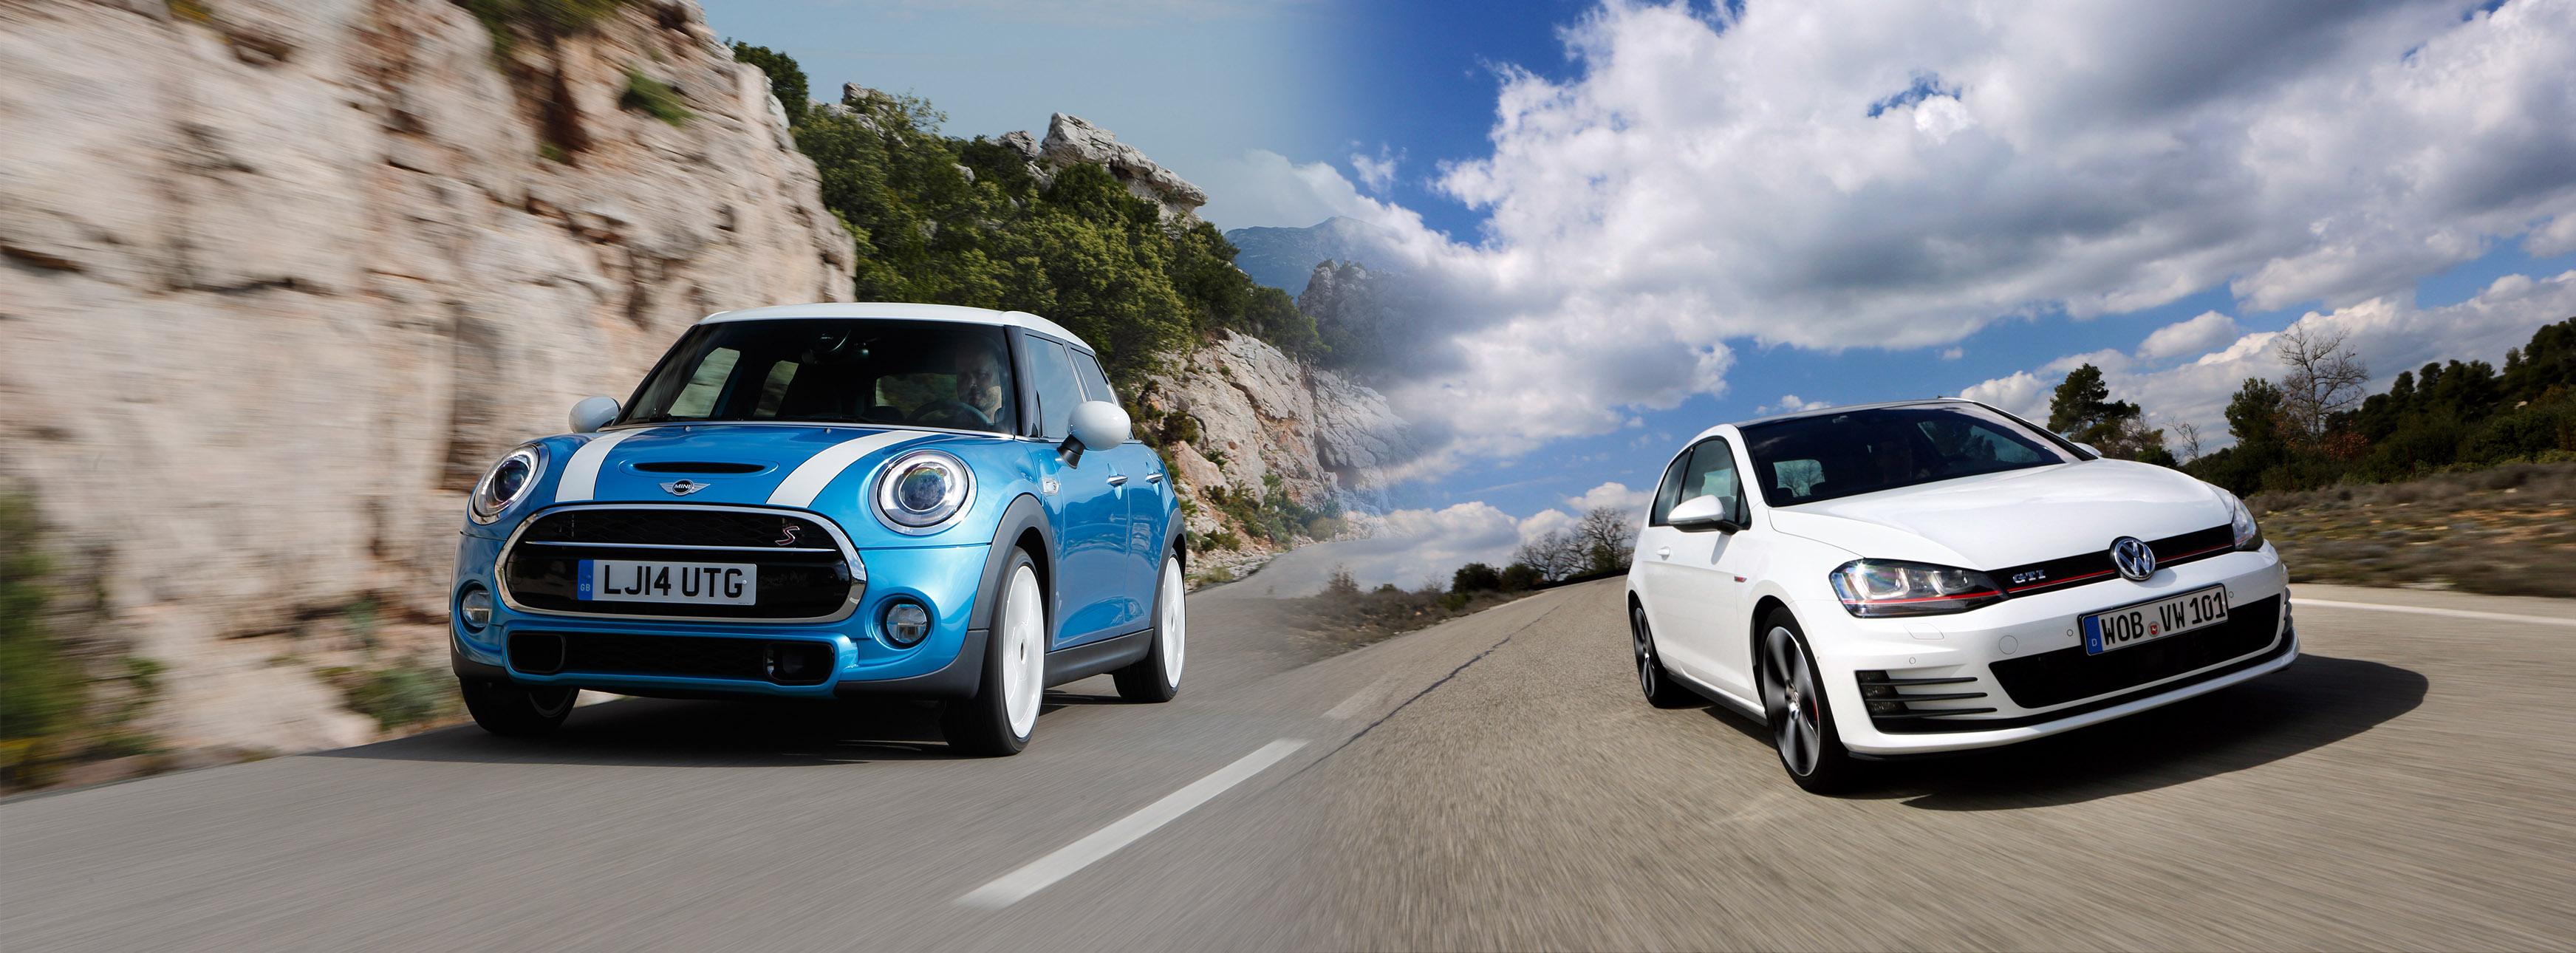 Volkswagen Golf Gti Vs Mini Cooper S Hot Hatch Legends Compared